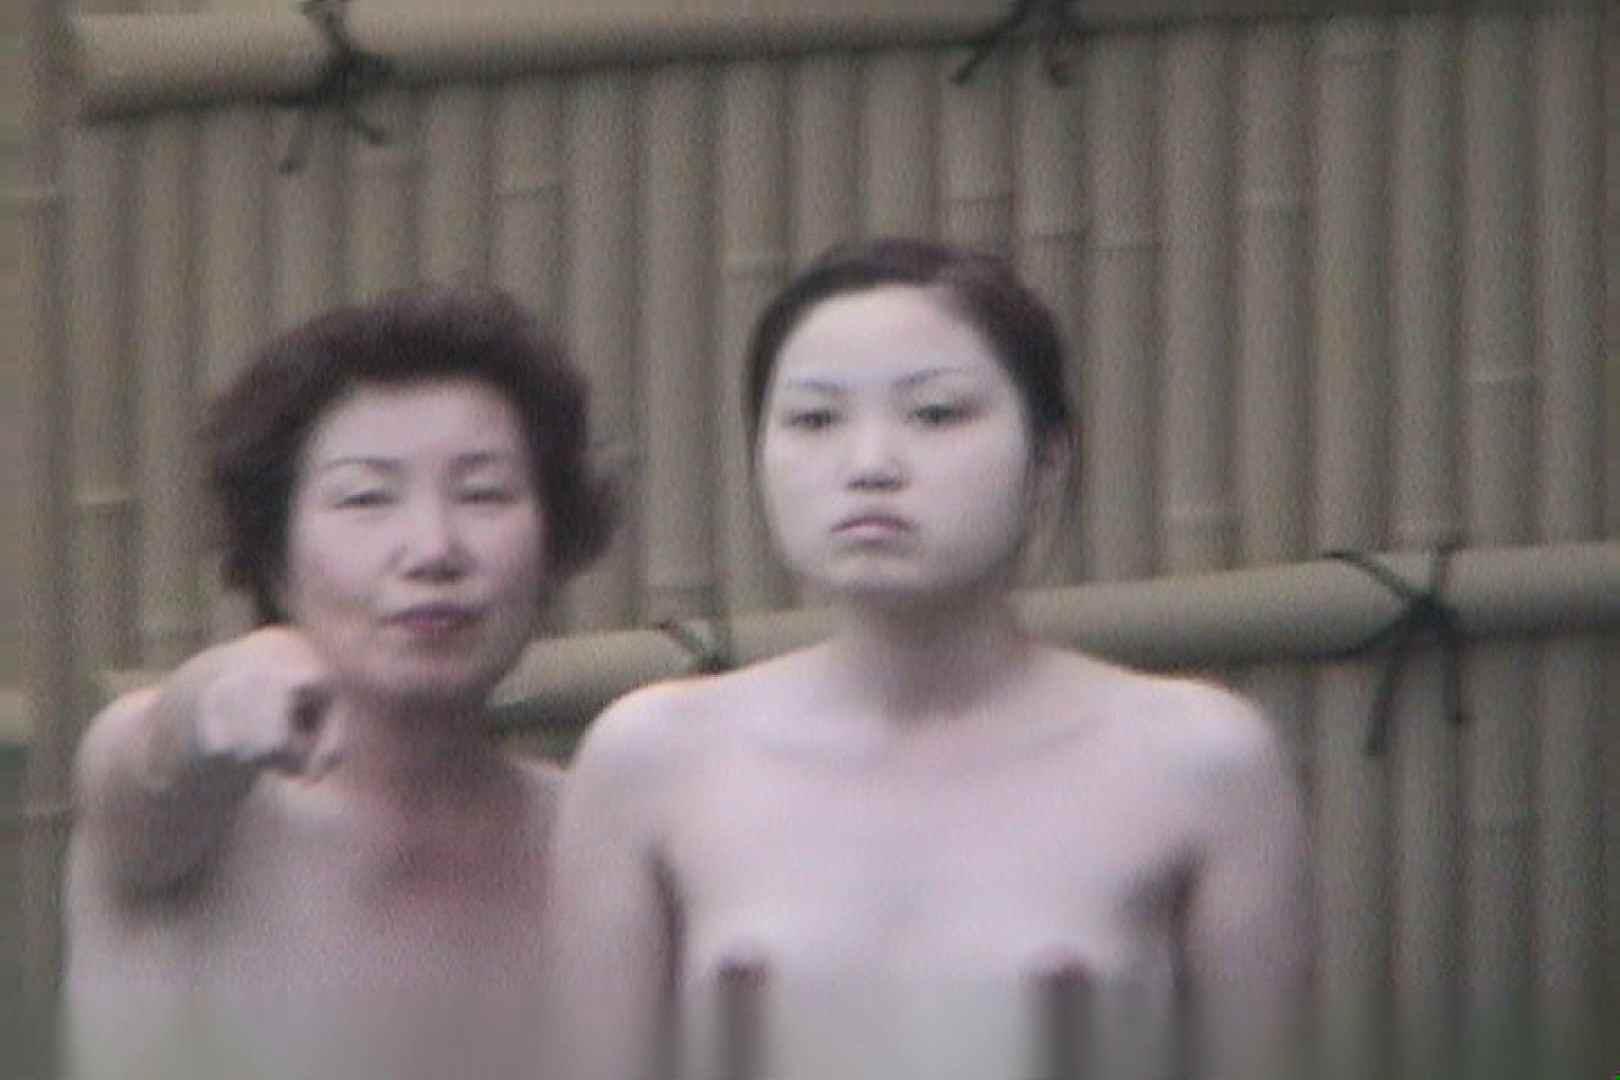 Aquaな露天風呂Vol.602 盗撮師作品  98pic 51